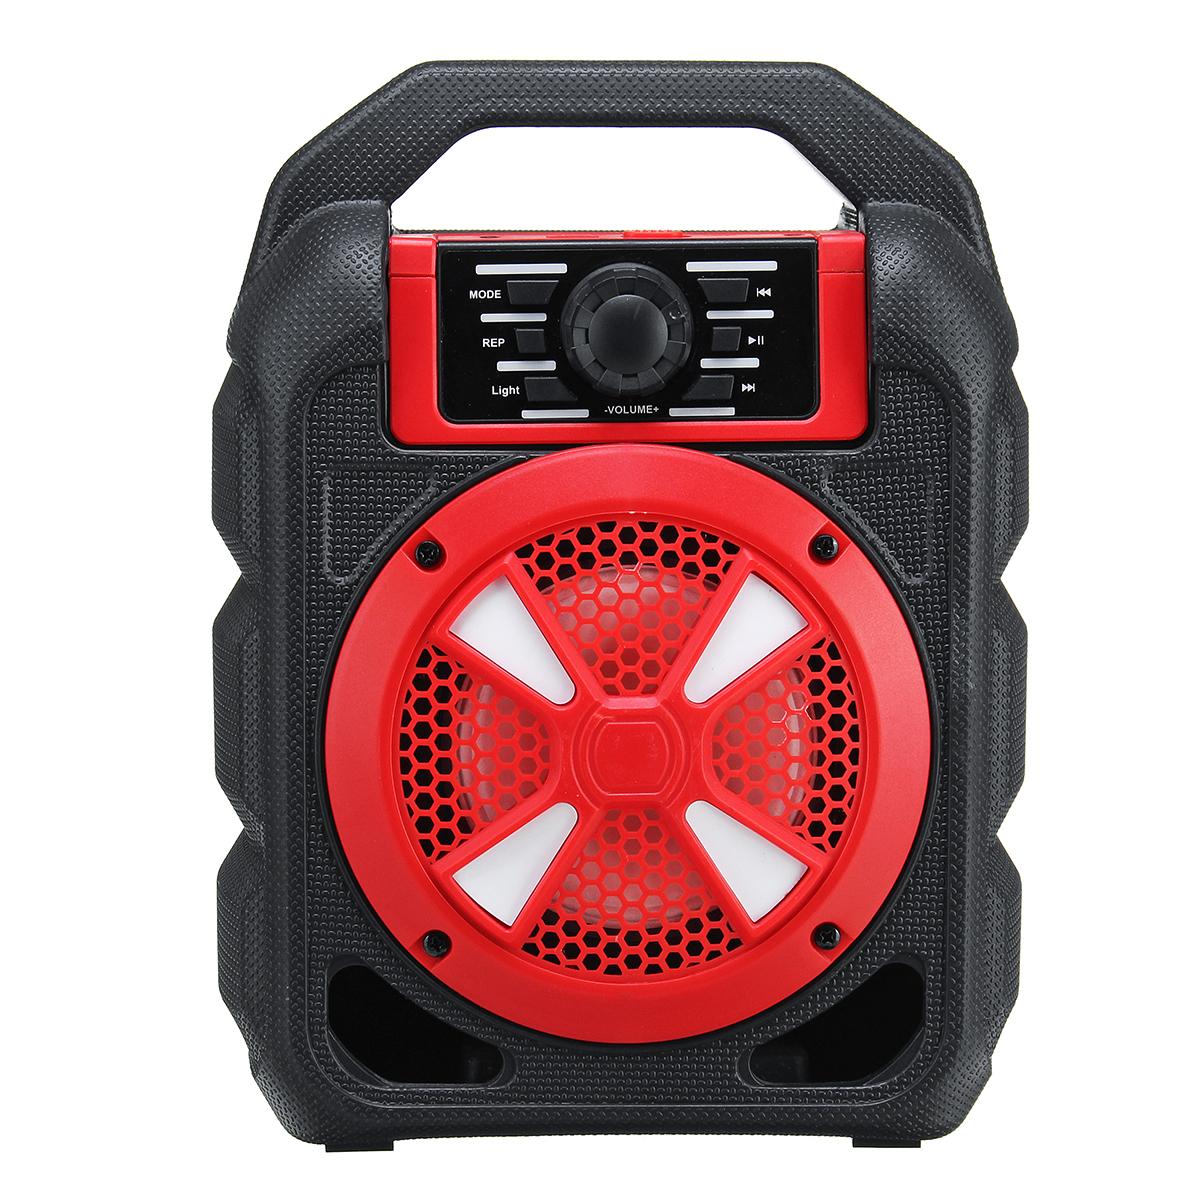 portabel 9w bluetooth trådlös högtalare colorful lätt hifi stereo ... 849d74c1e20f7